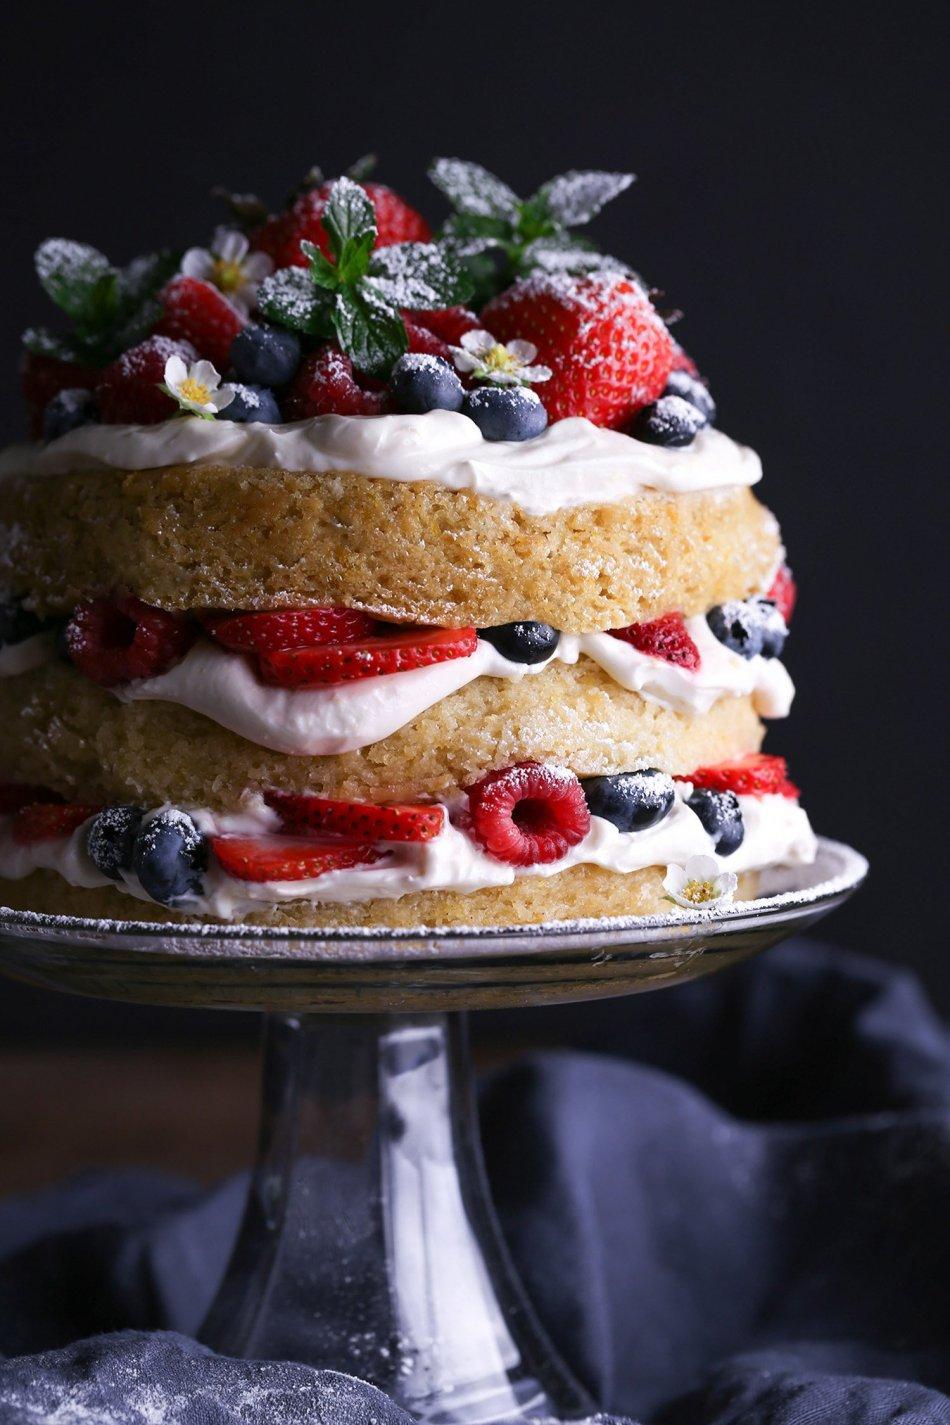 Lemon Cake with Fresh Berries | Vegan friendly with Gluten-Free Alternative